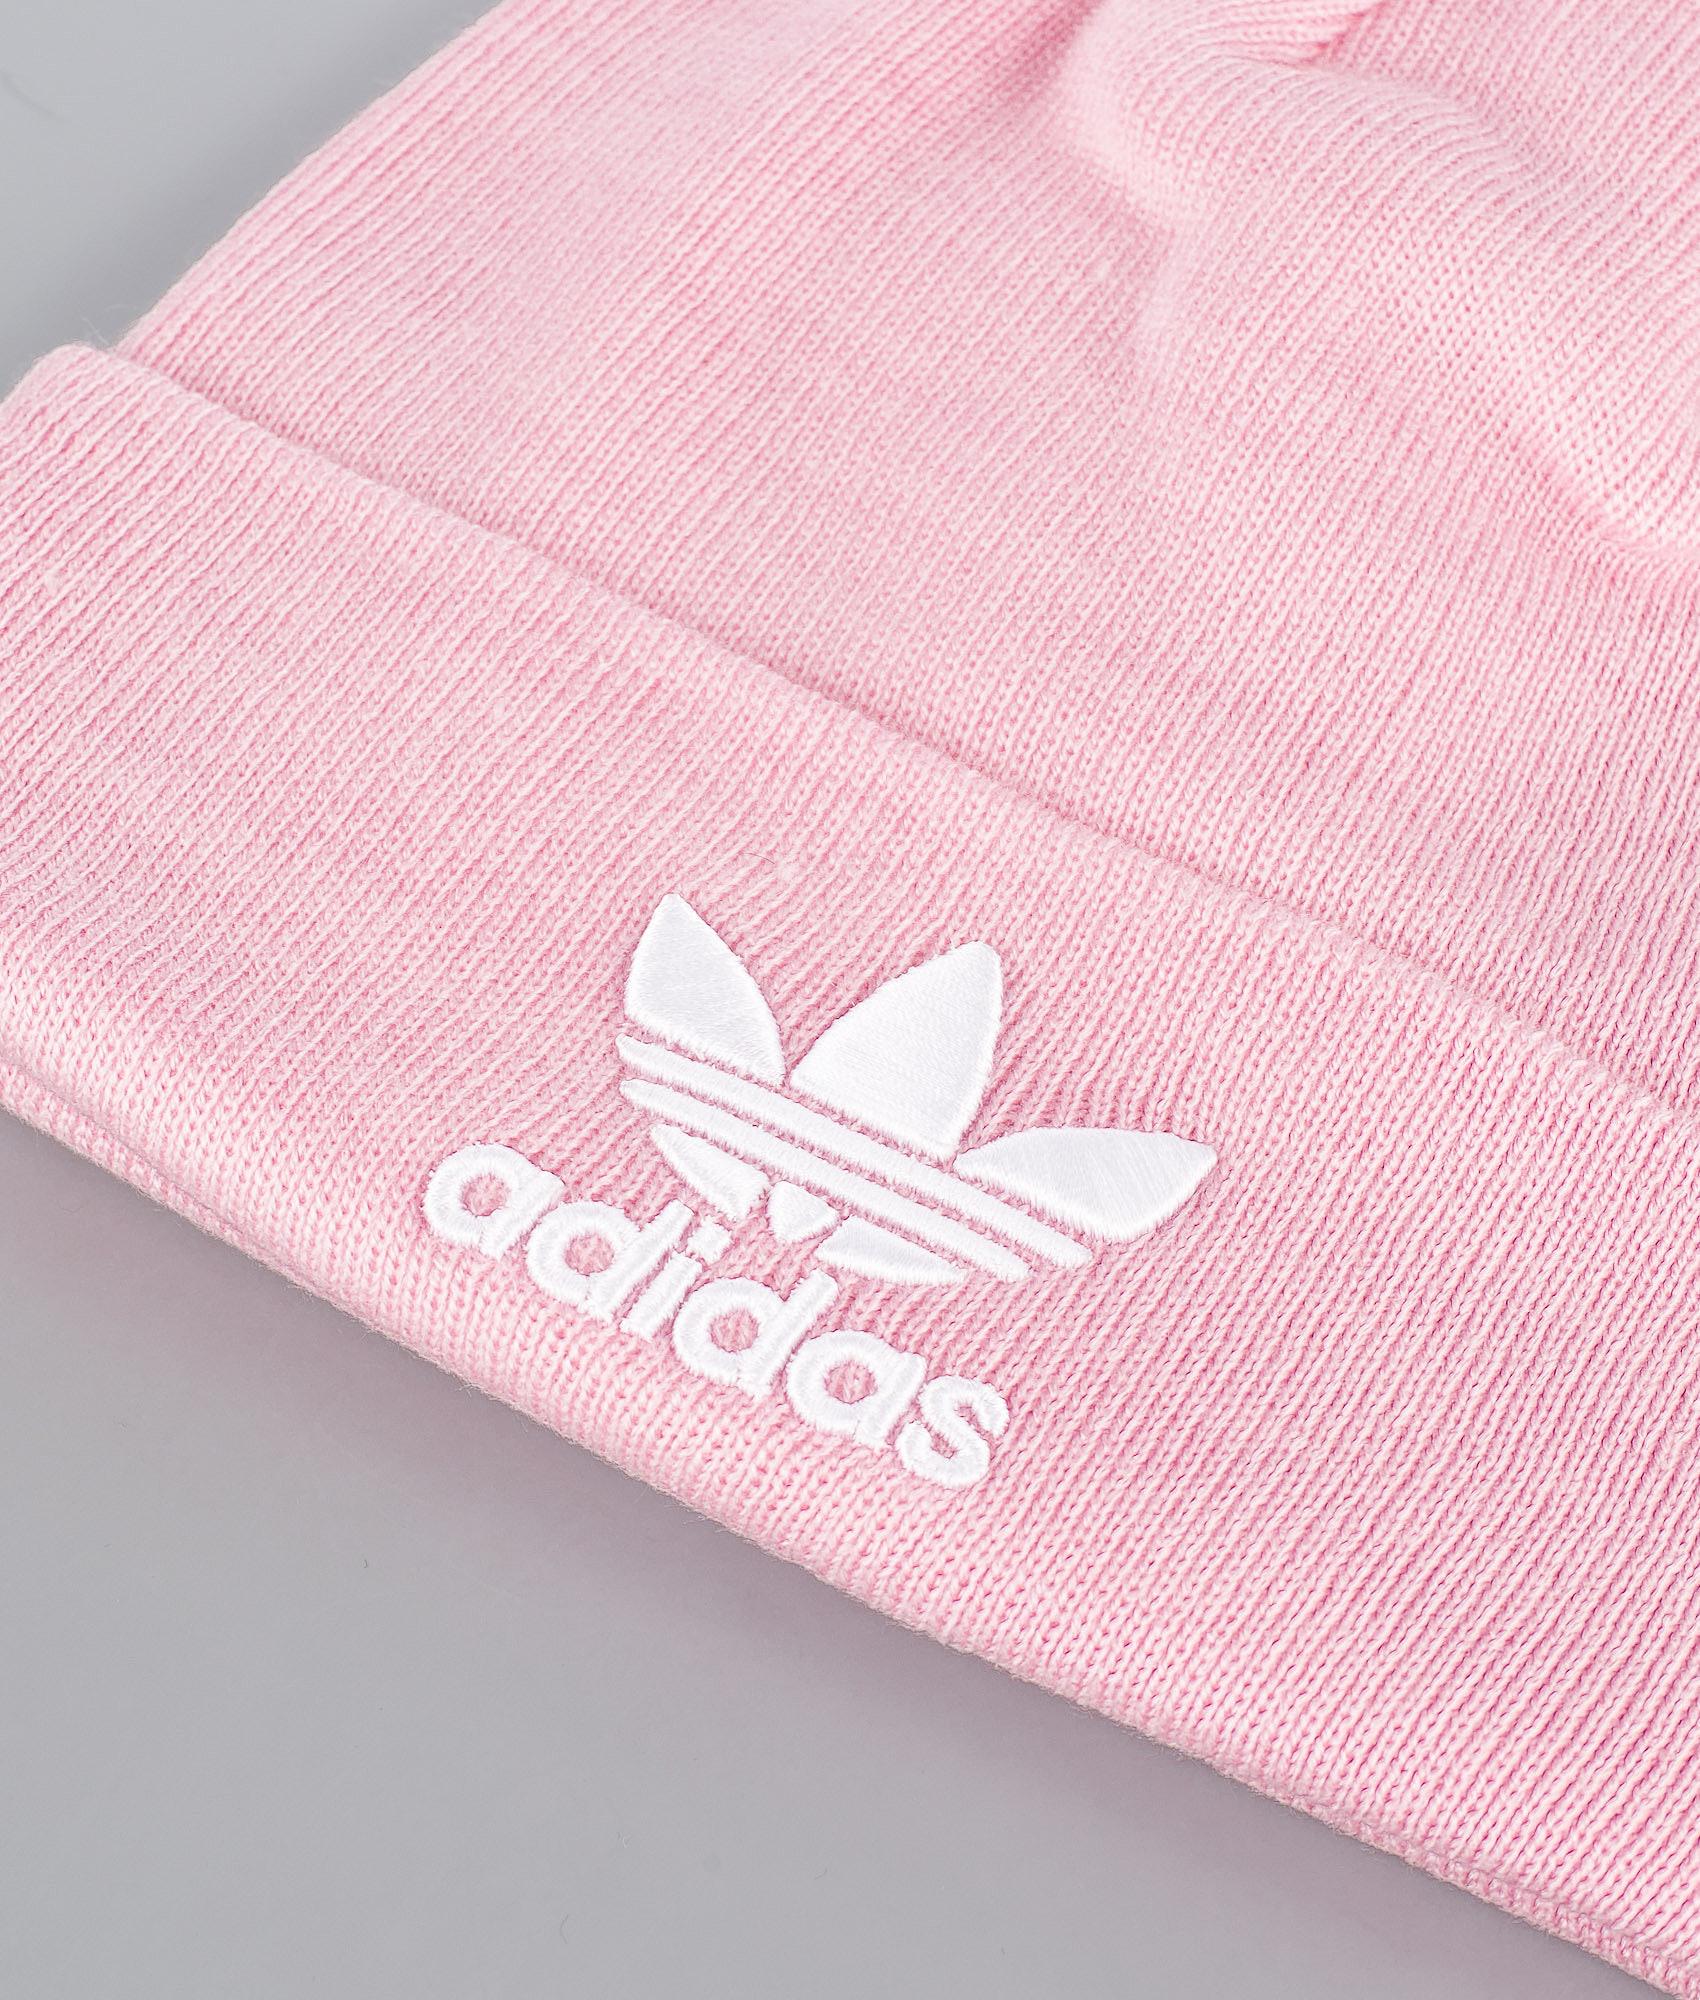 Adidas Originals Trefoil Beanie Clear Pink - Ridestore.com 58fde42b56